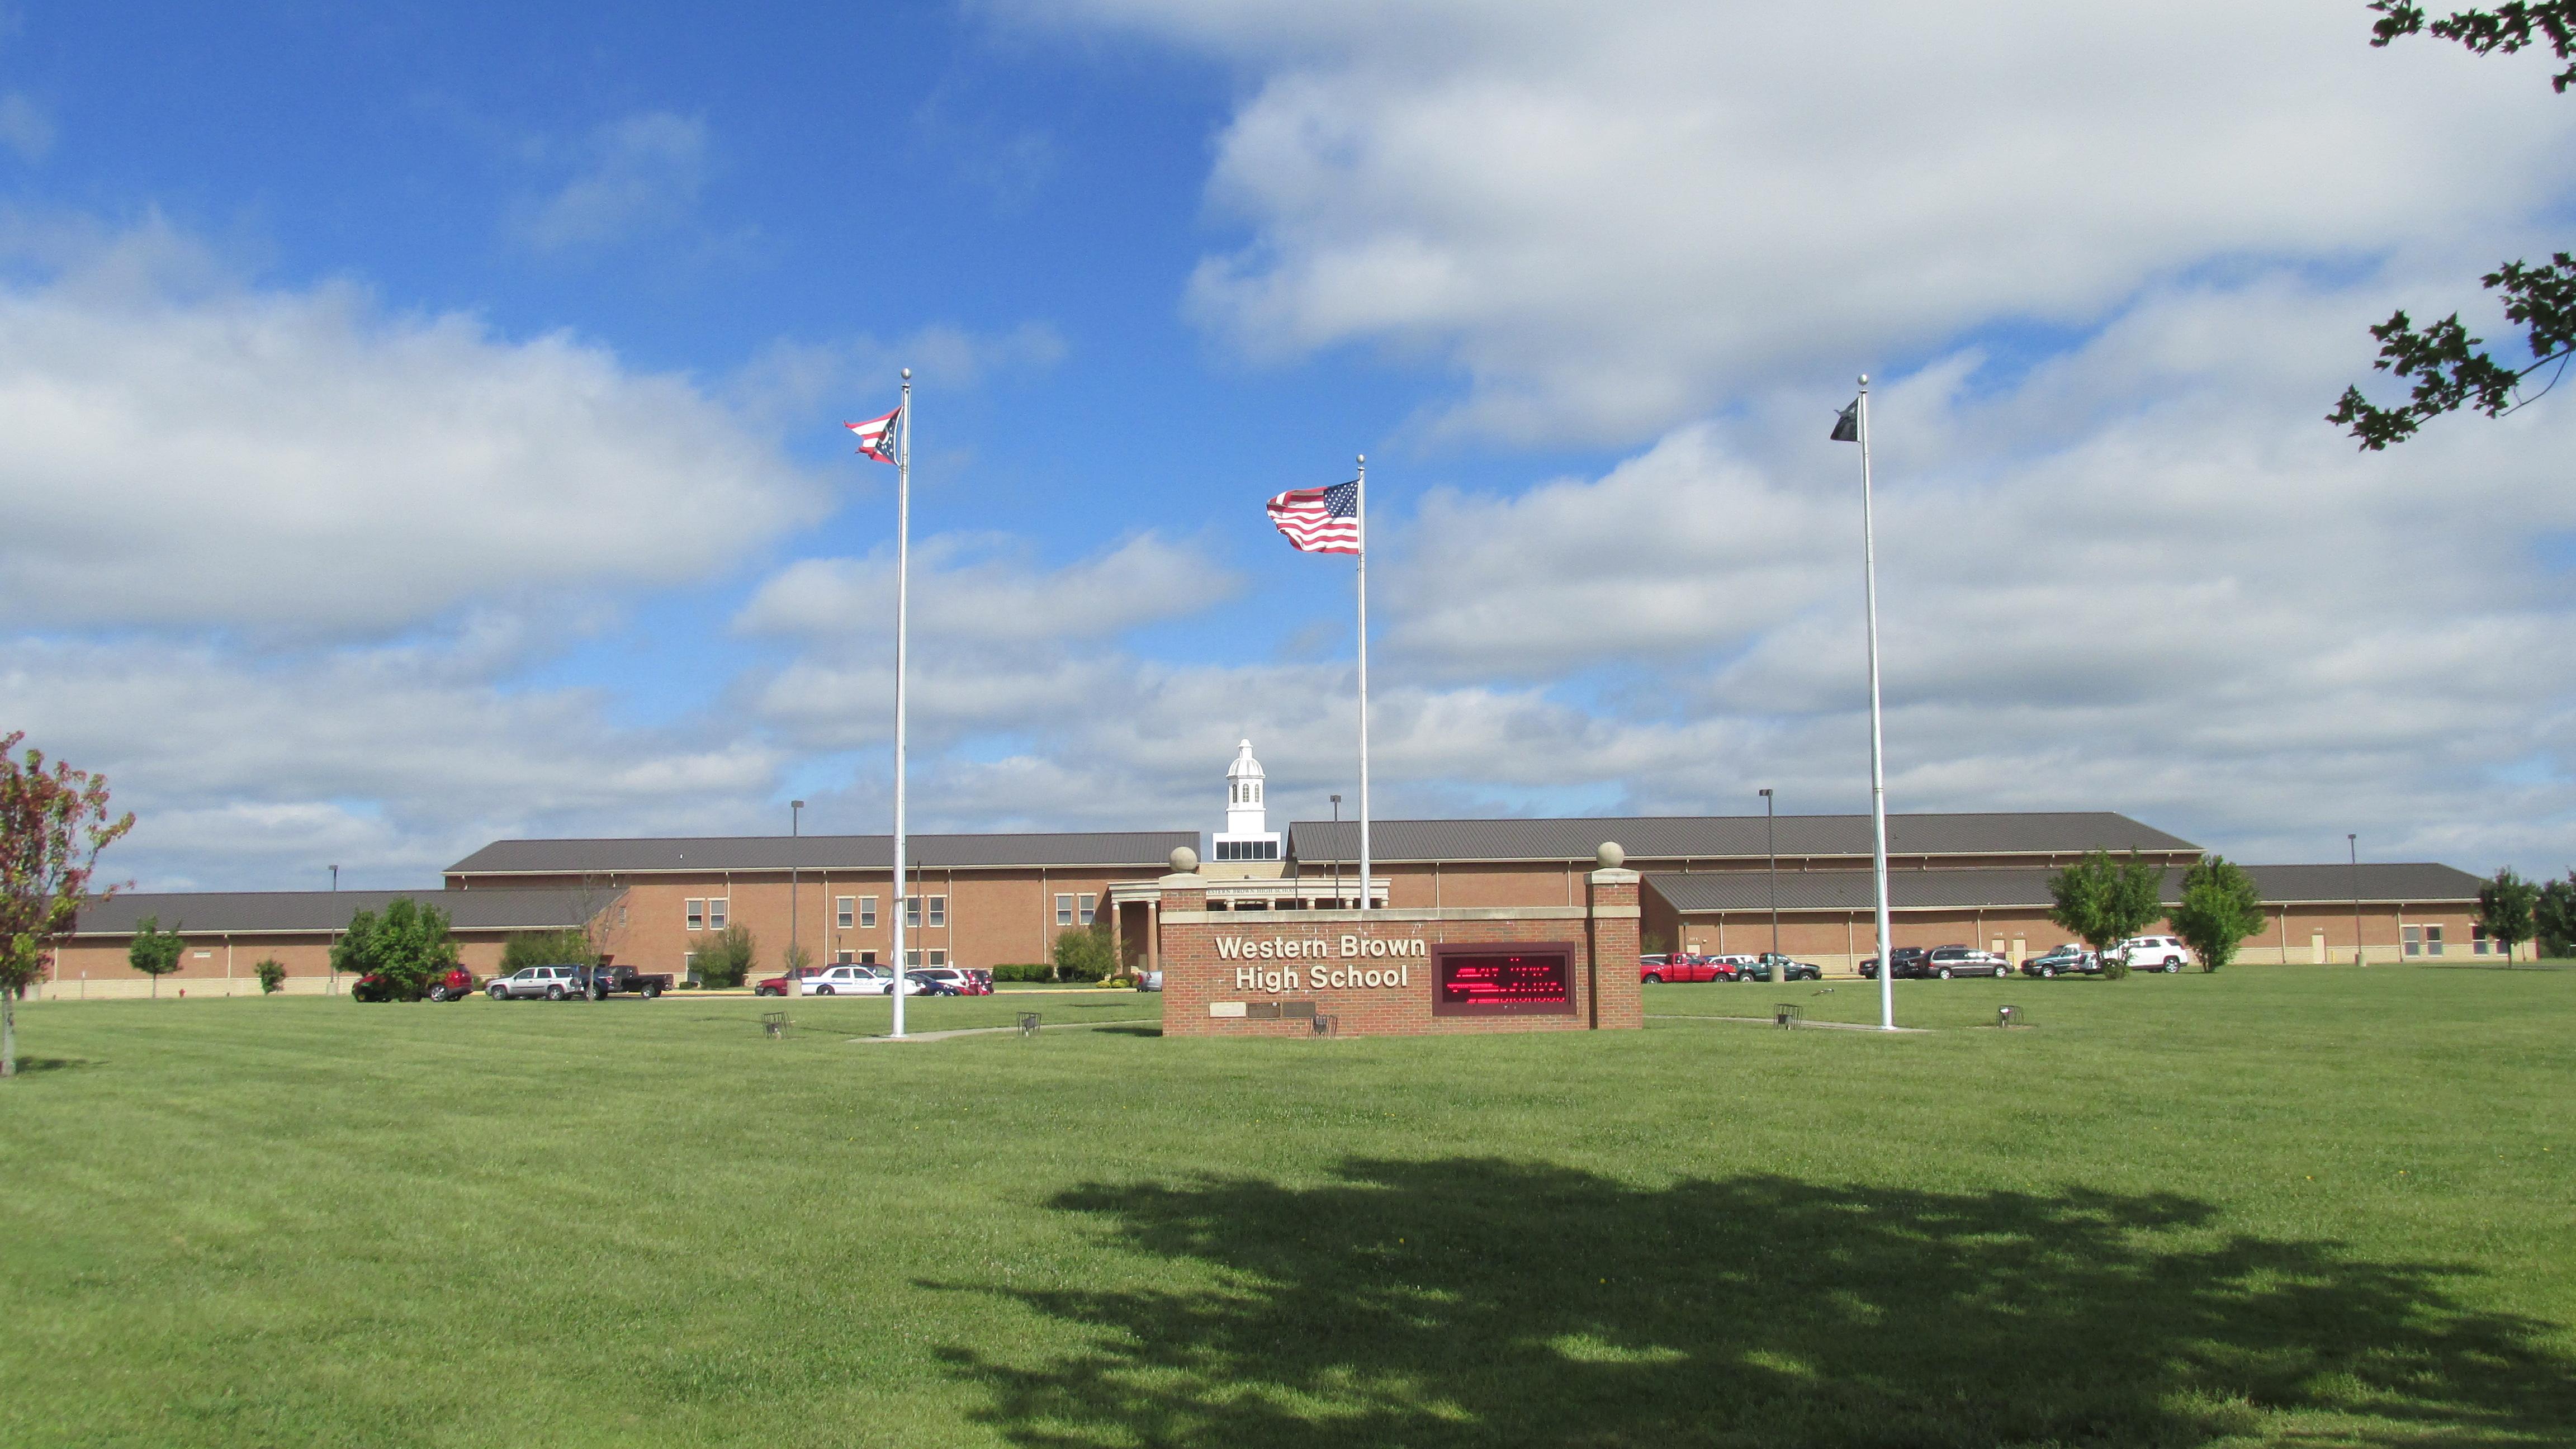 Western Brown High School Wikipedia